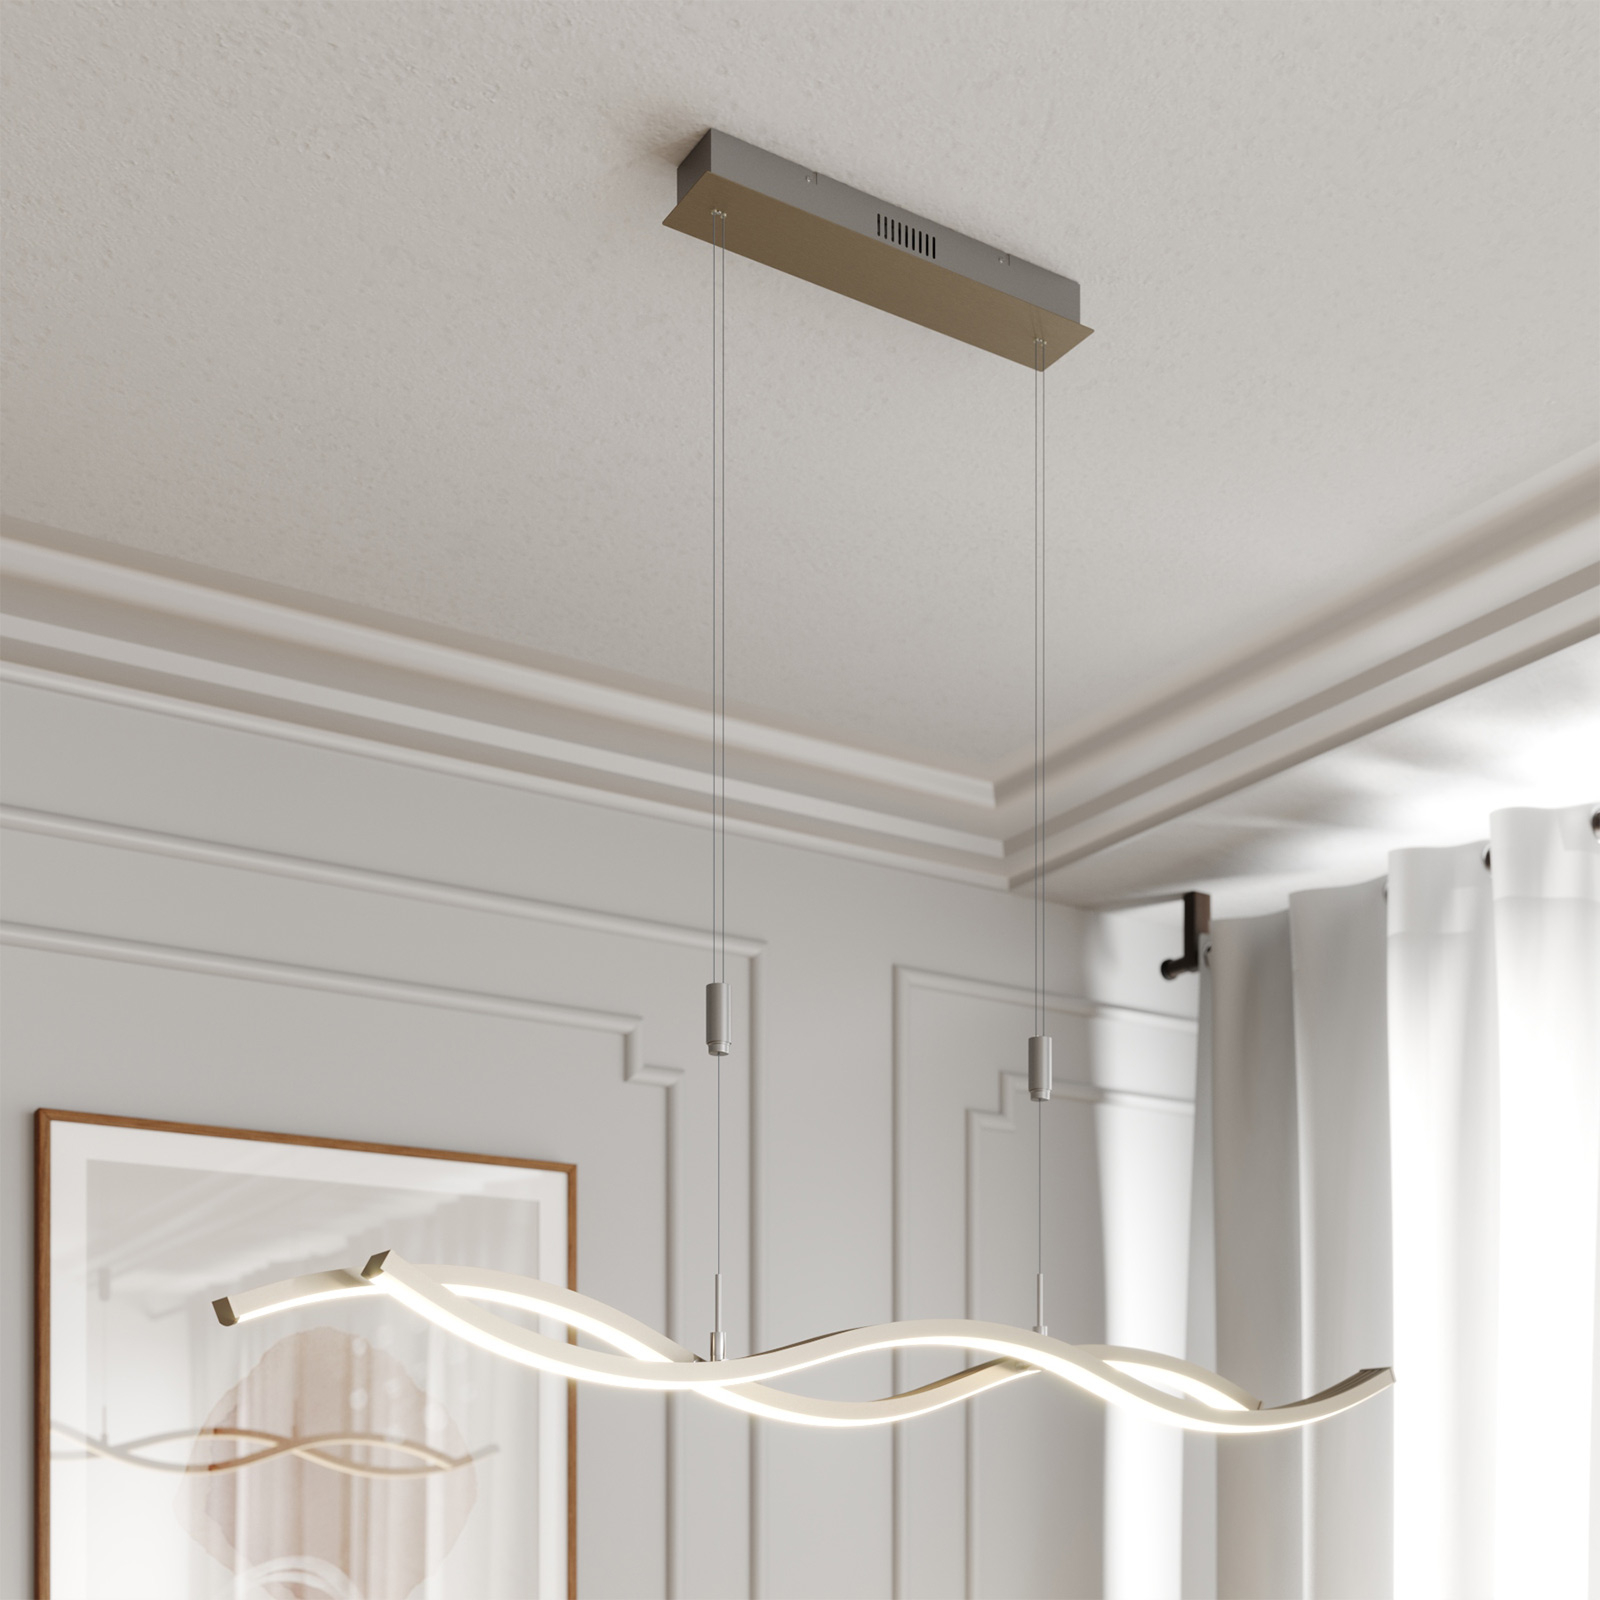 Lucande LED závěsné světlo Mairia, nastav. výška